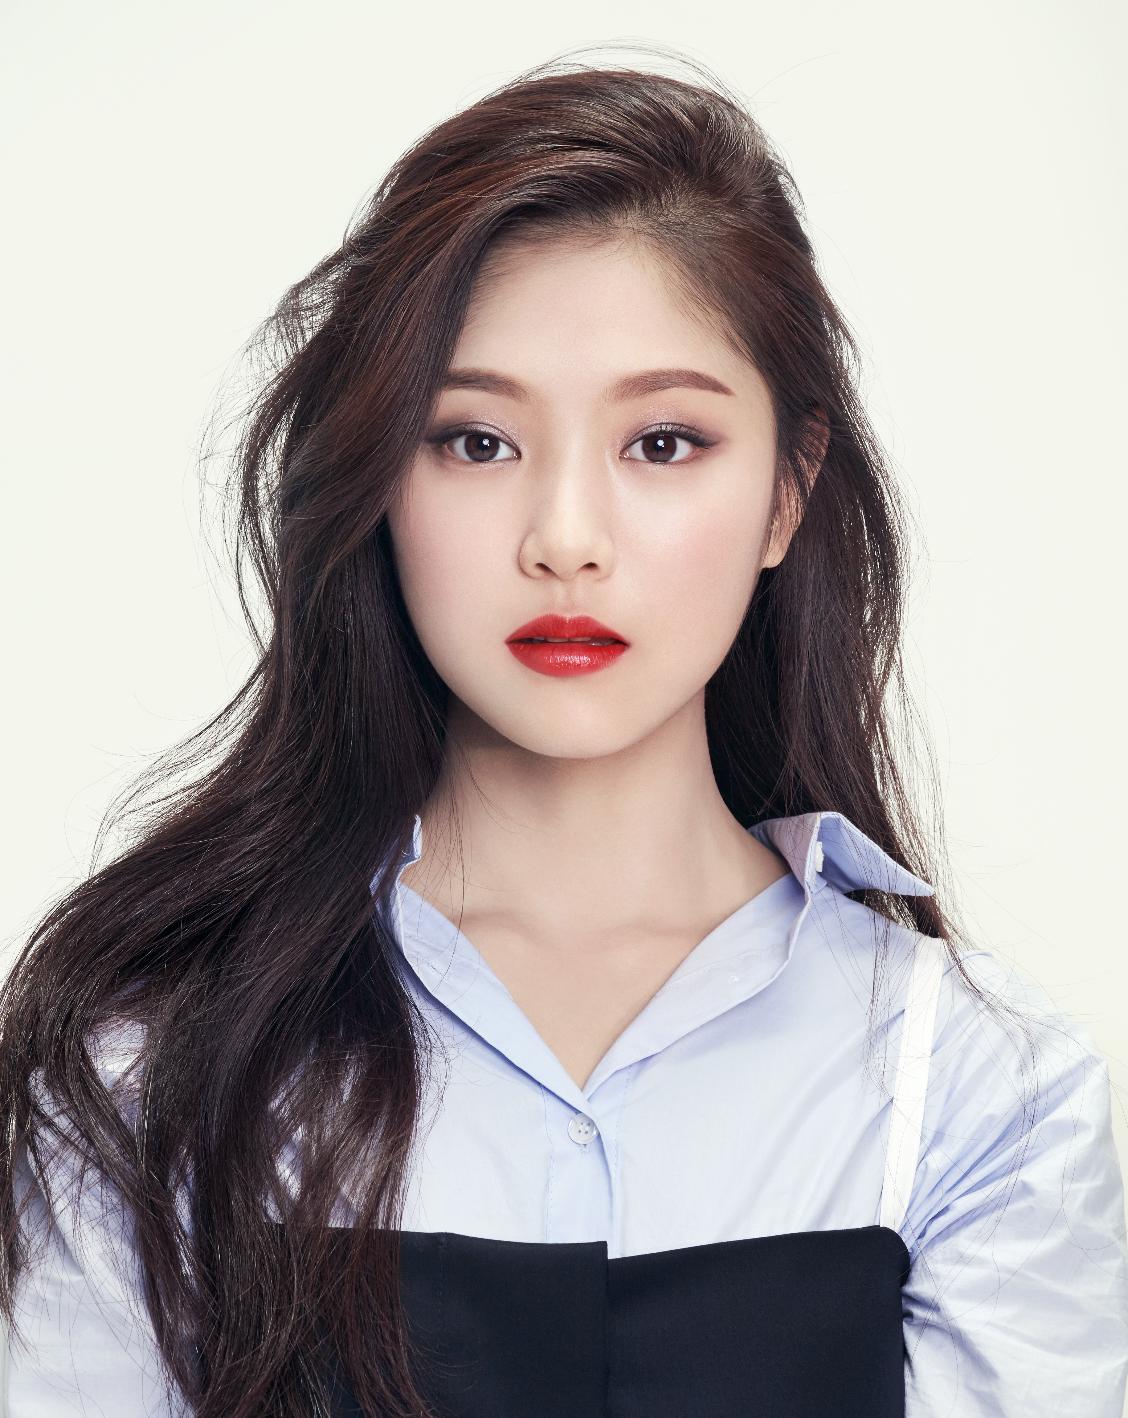 LOONA - Hyunjin | Kpop girls, Korean girl groups, Kpop